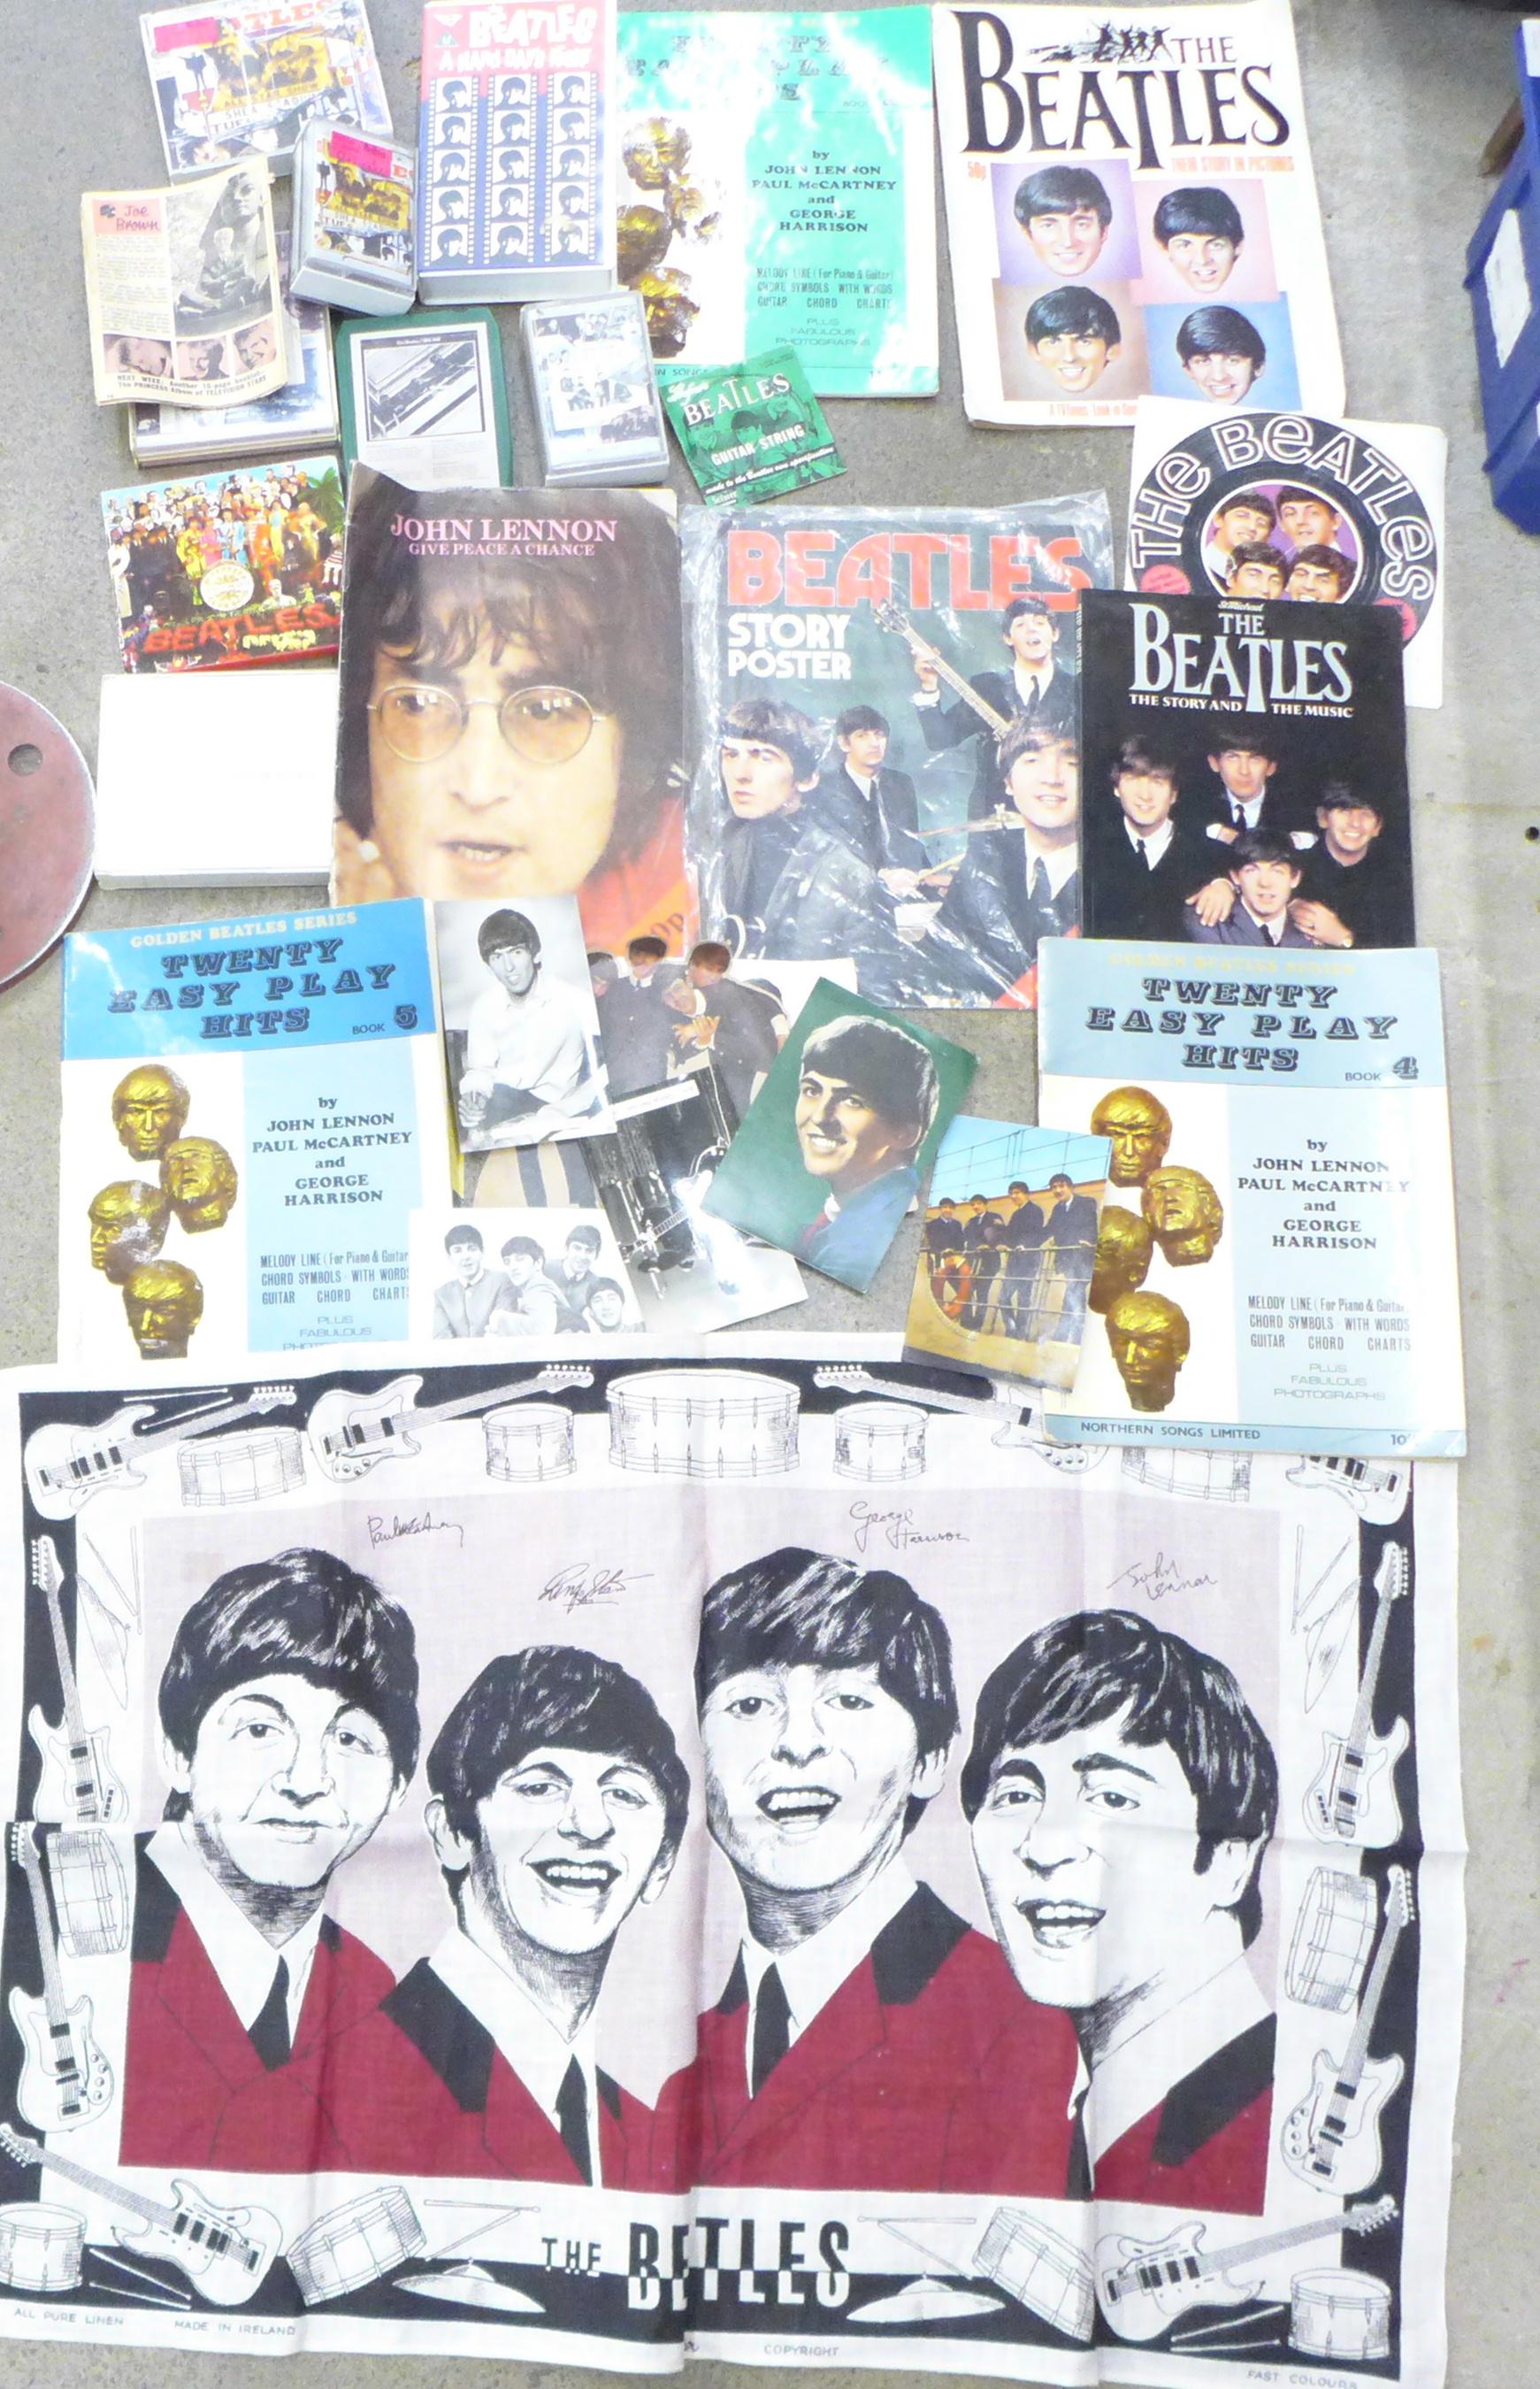 Beatles memorabilia including tea towel, postcards, promotional photograph, EasyPlay Hits songbooks,